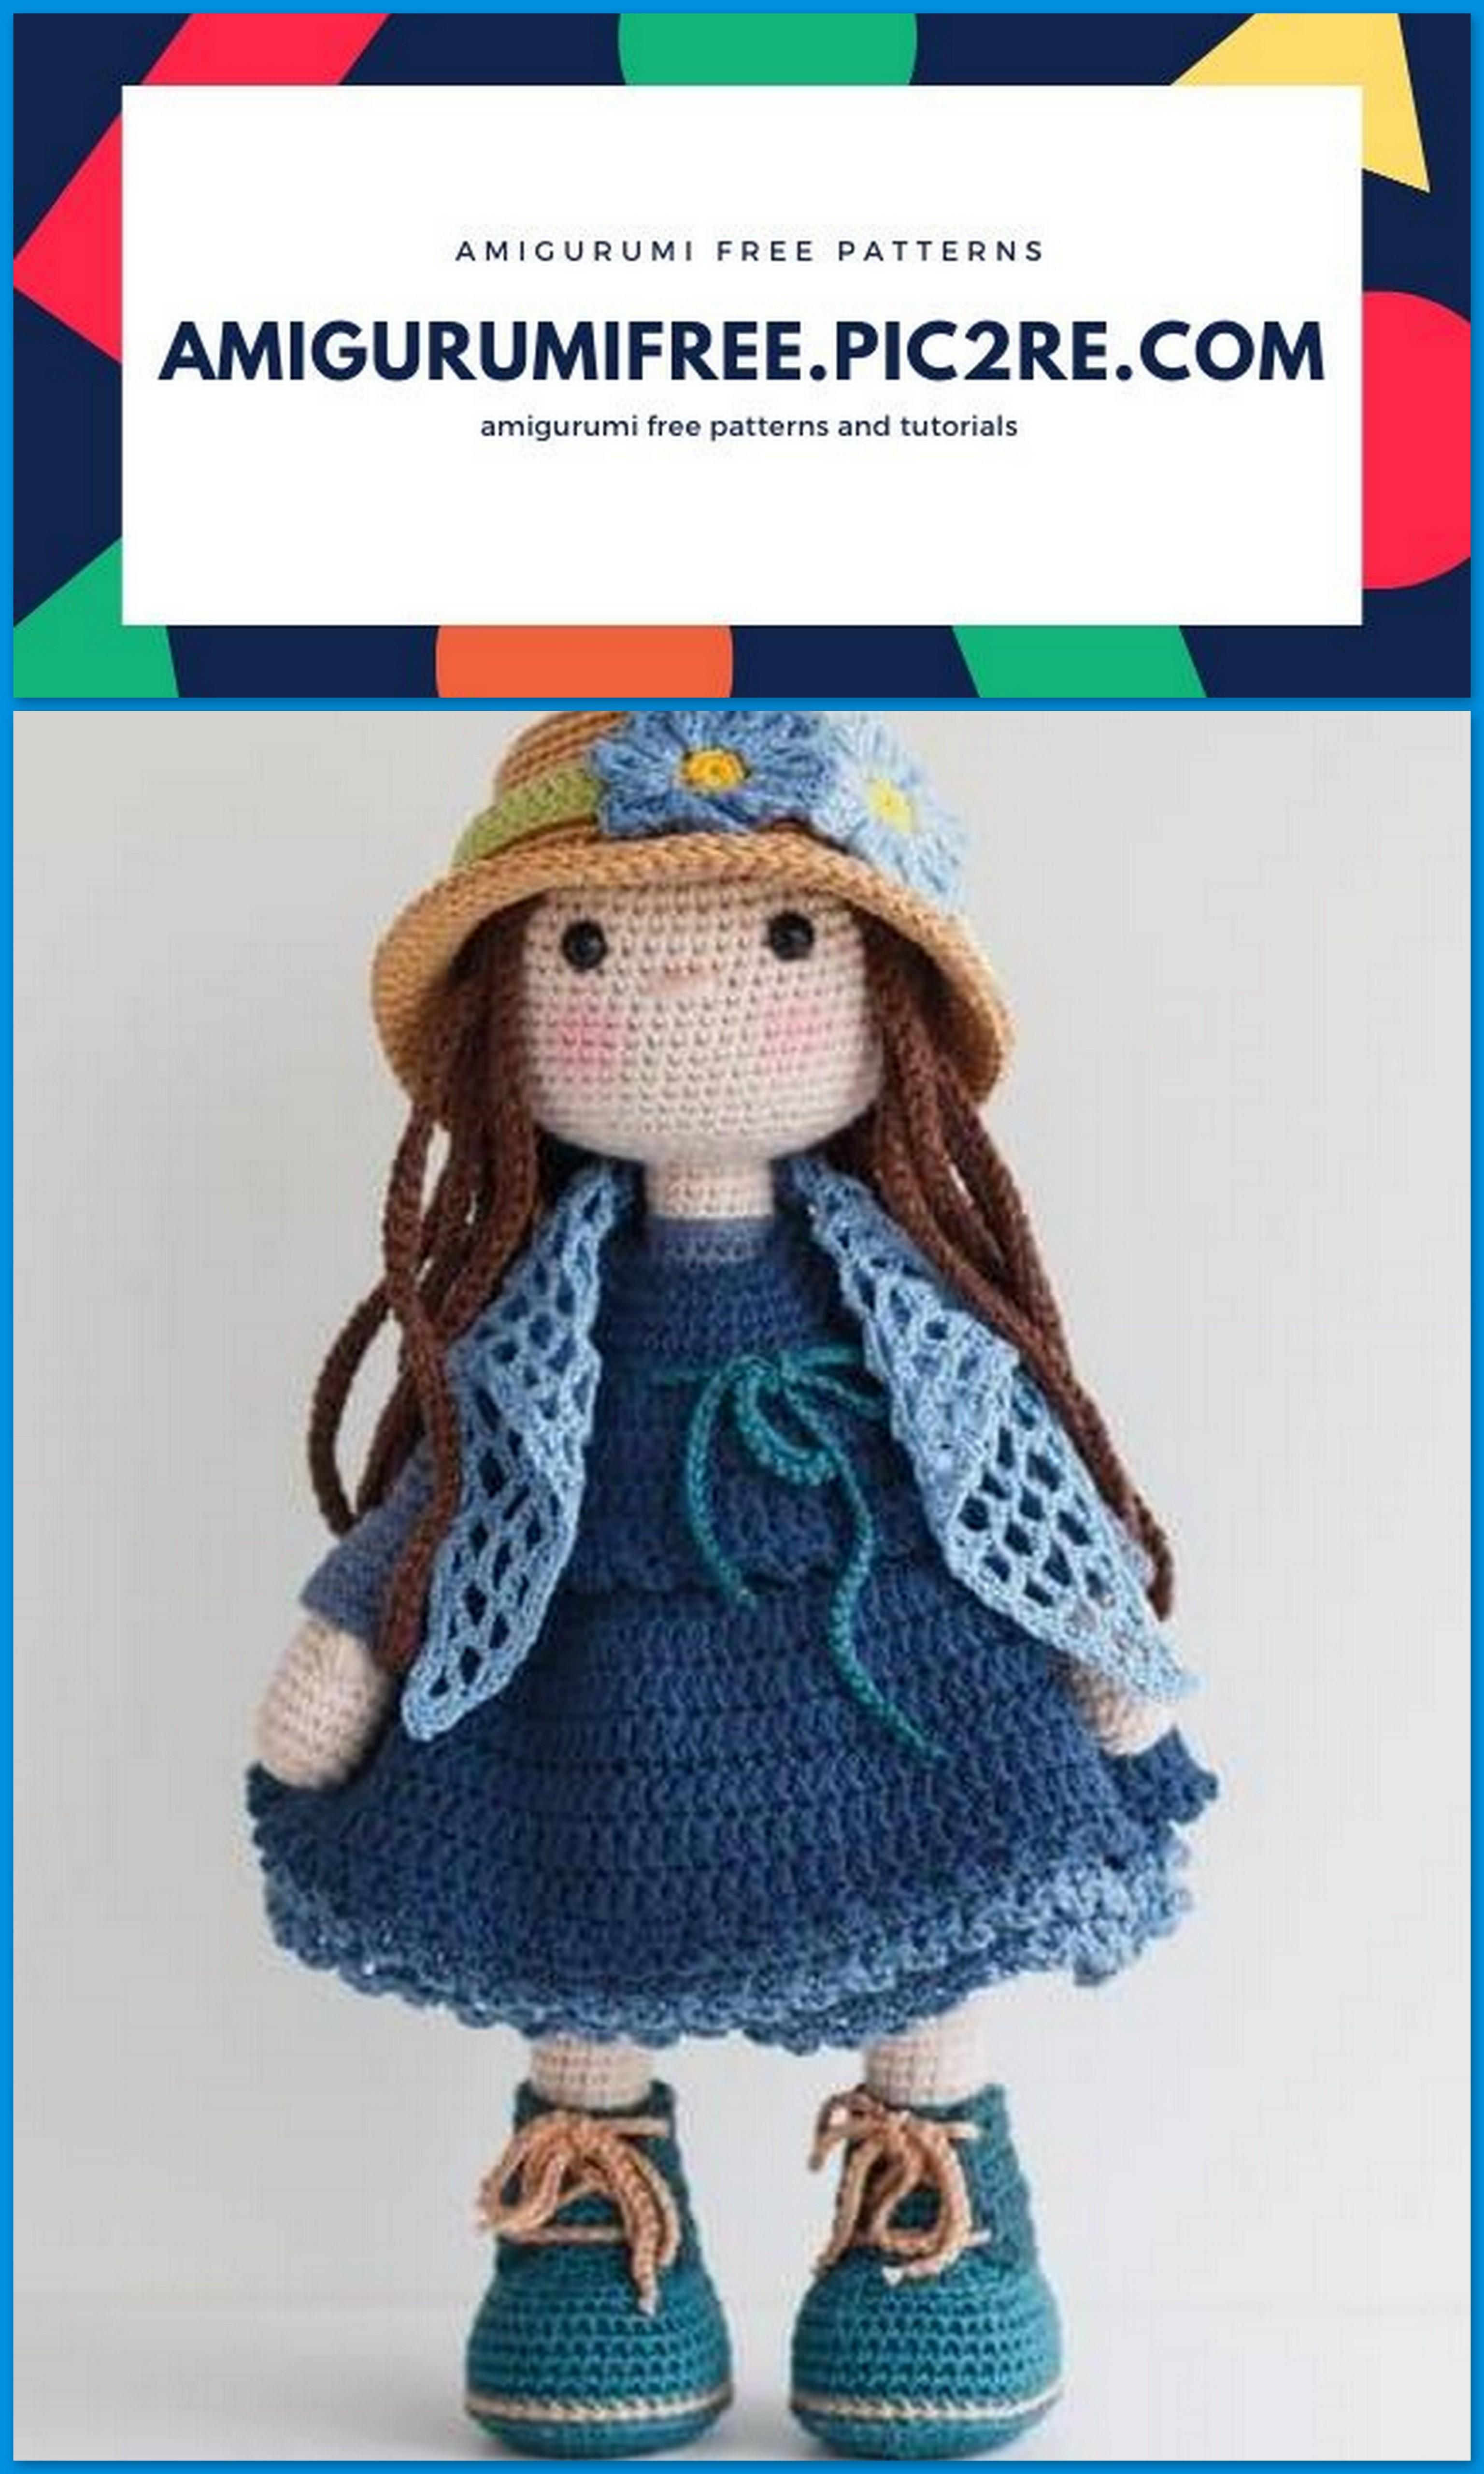 Amigurumi Crochet Eyes : Amigurumi anime eyes on cotton by Shia ... | 5120x3072